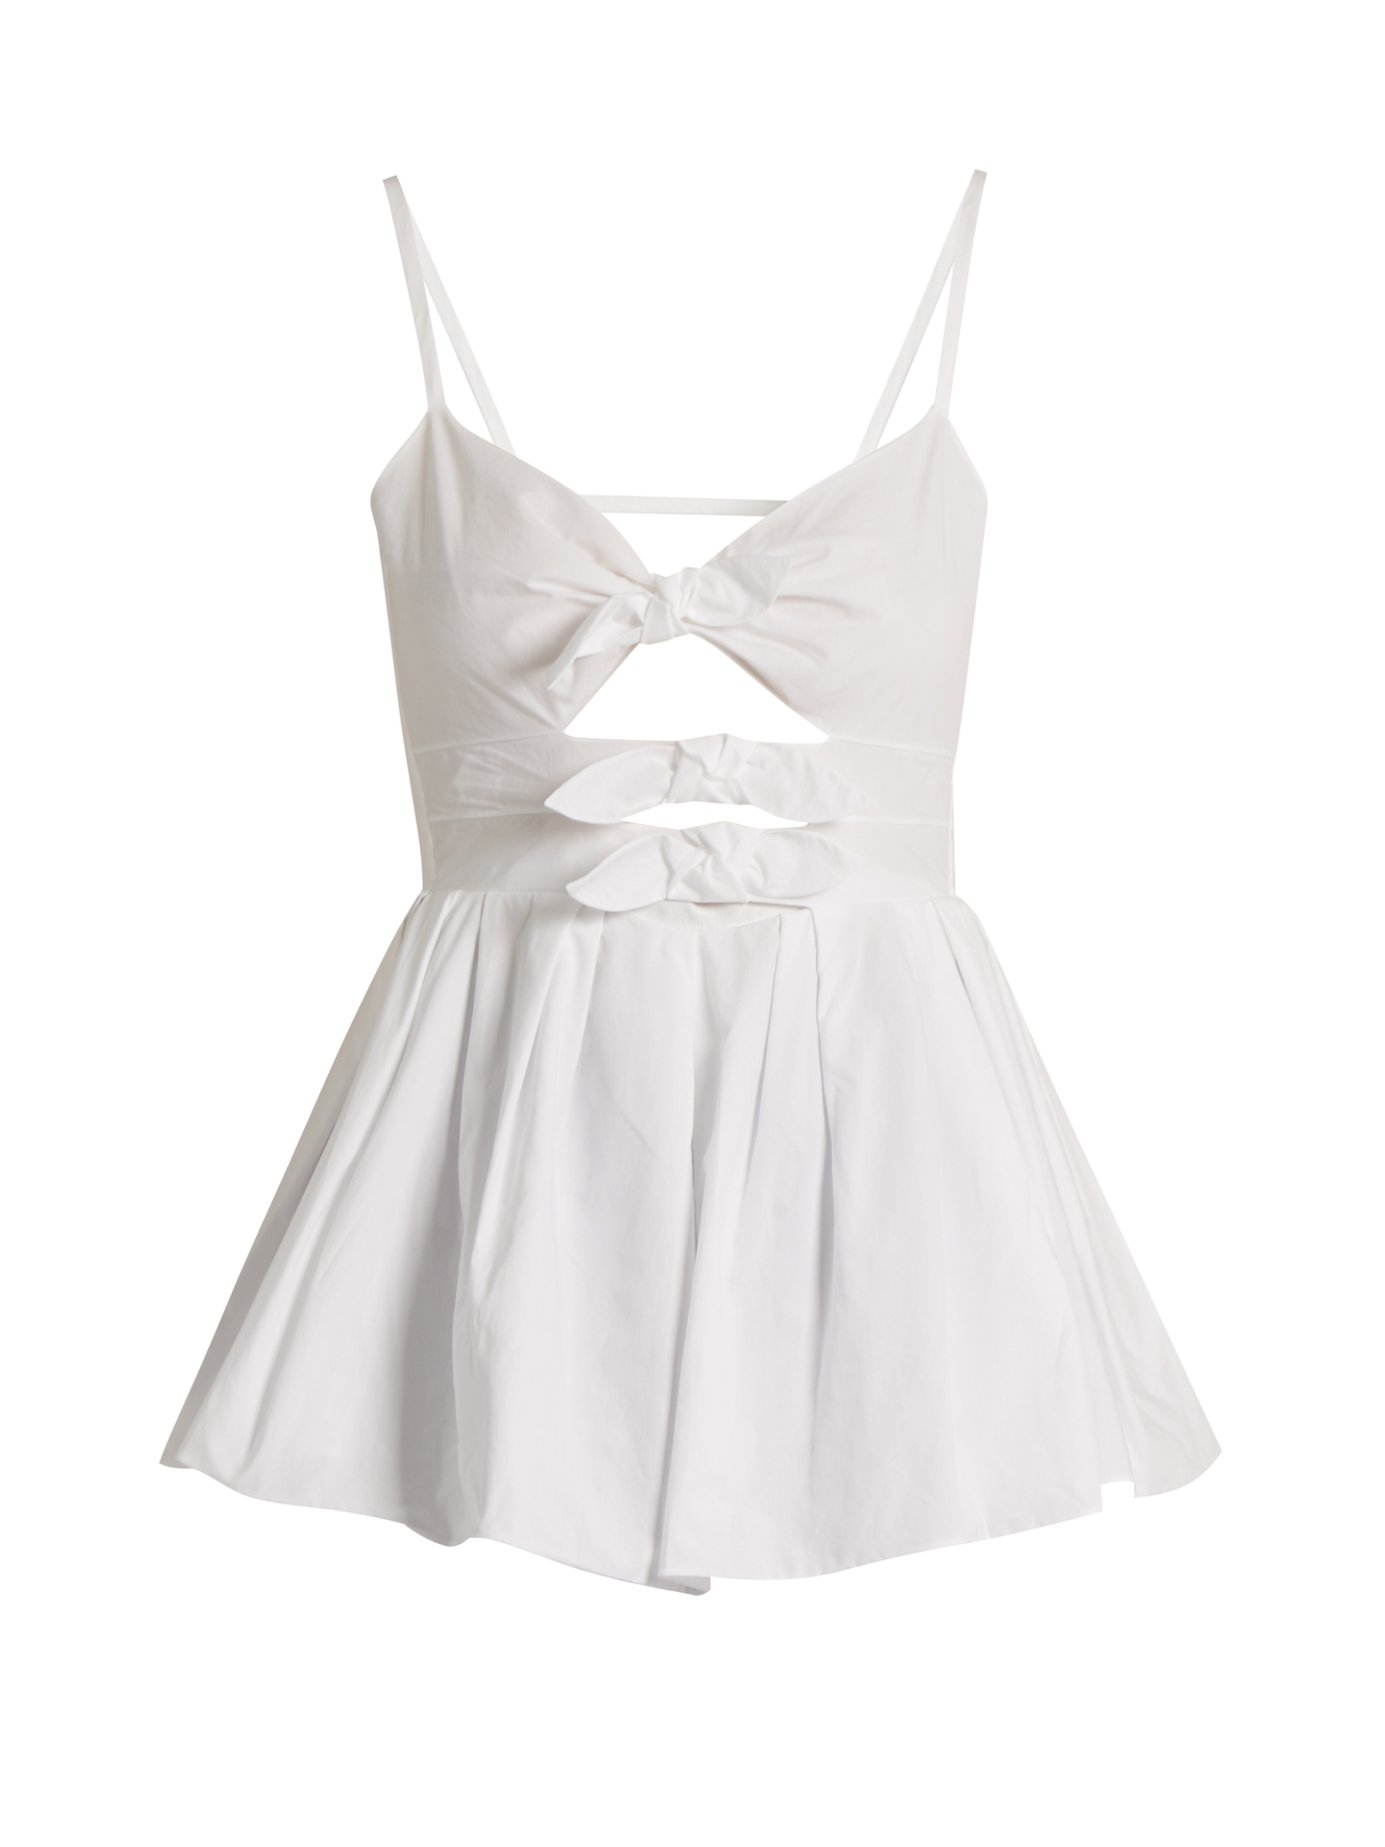 d0ed1936c4 Delpozo - Triple-Bow Cotton-Poplin Top